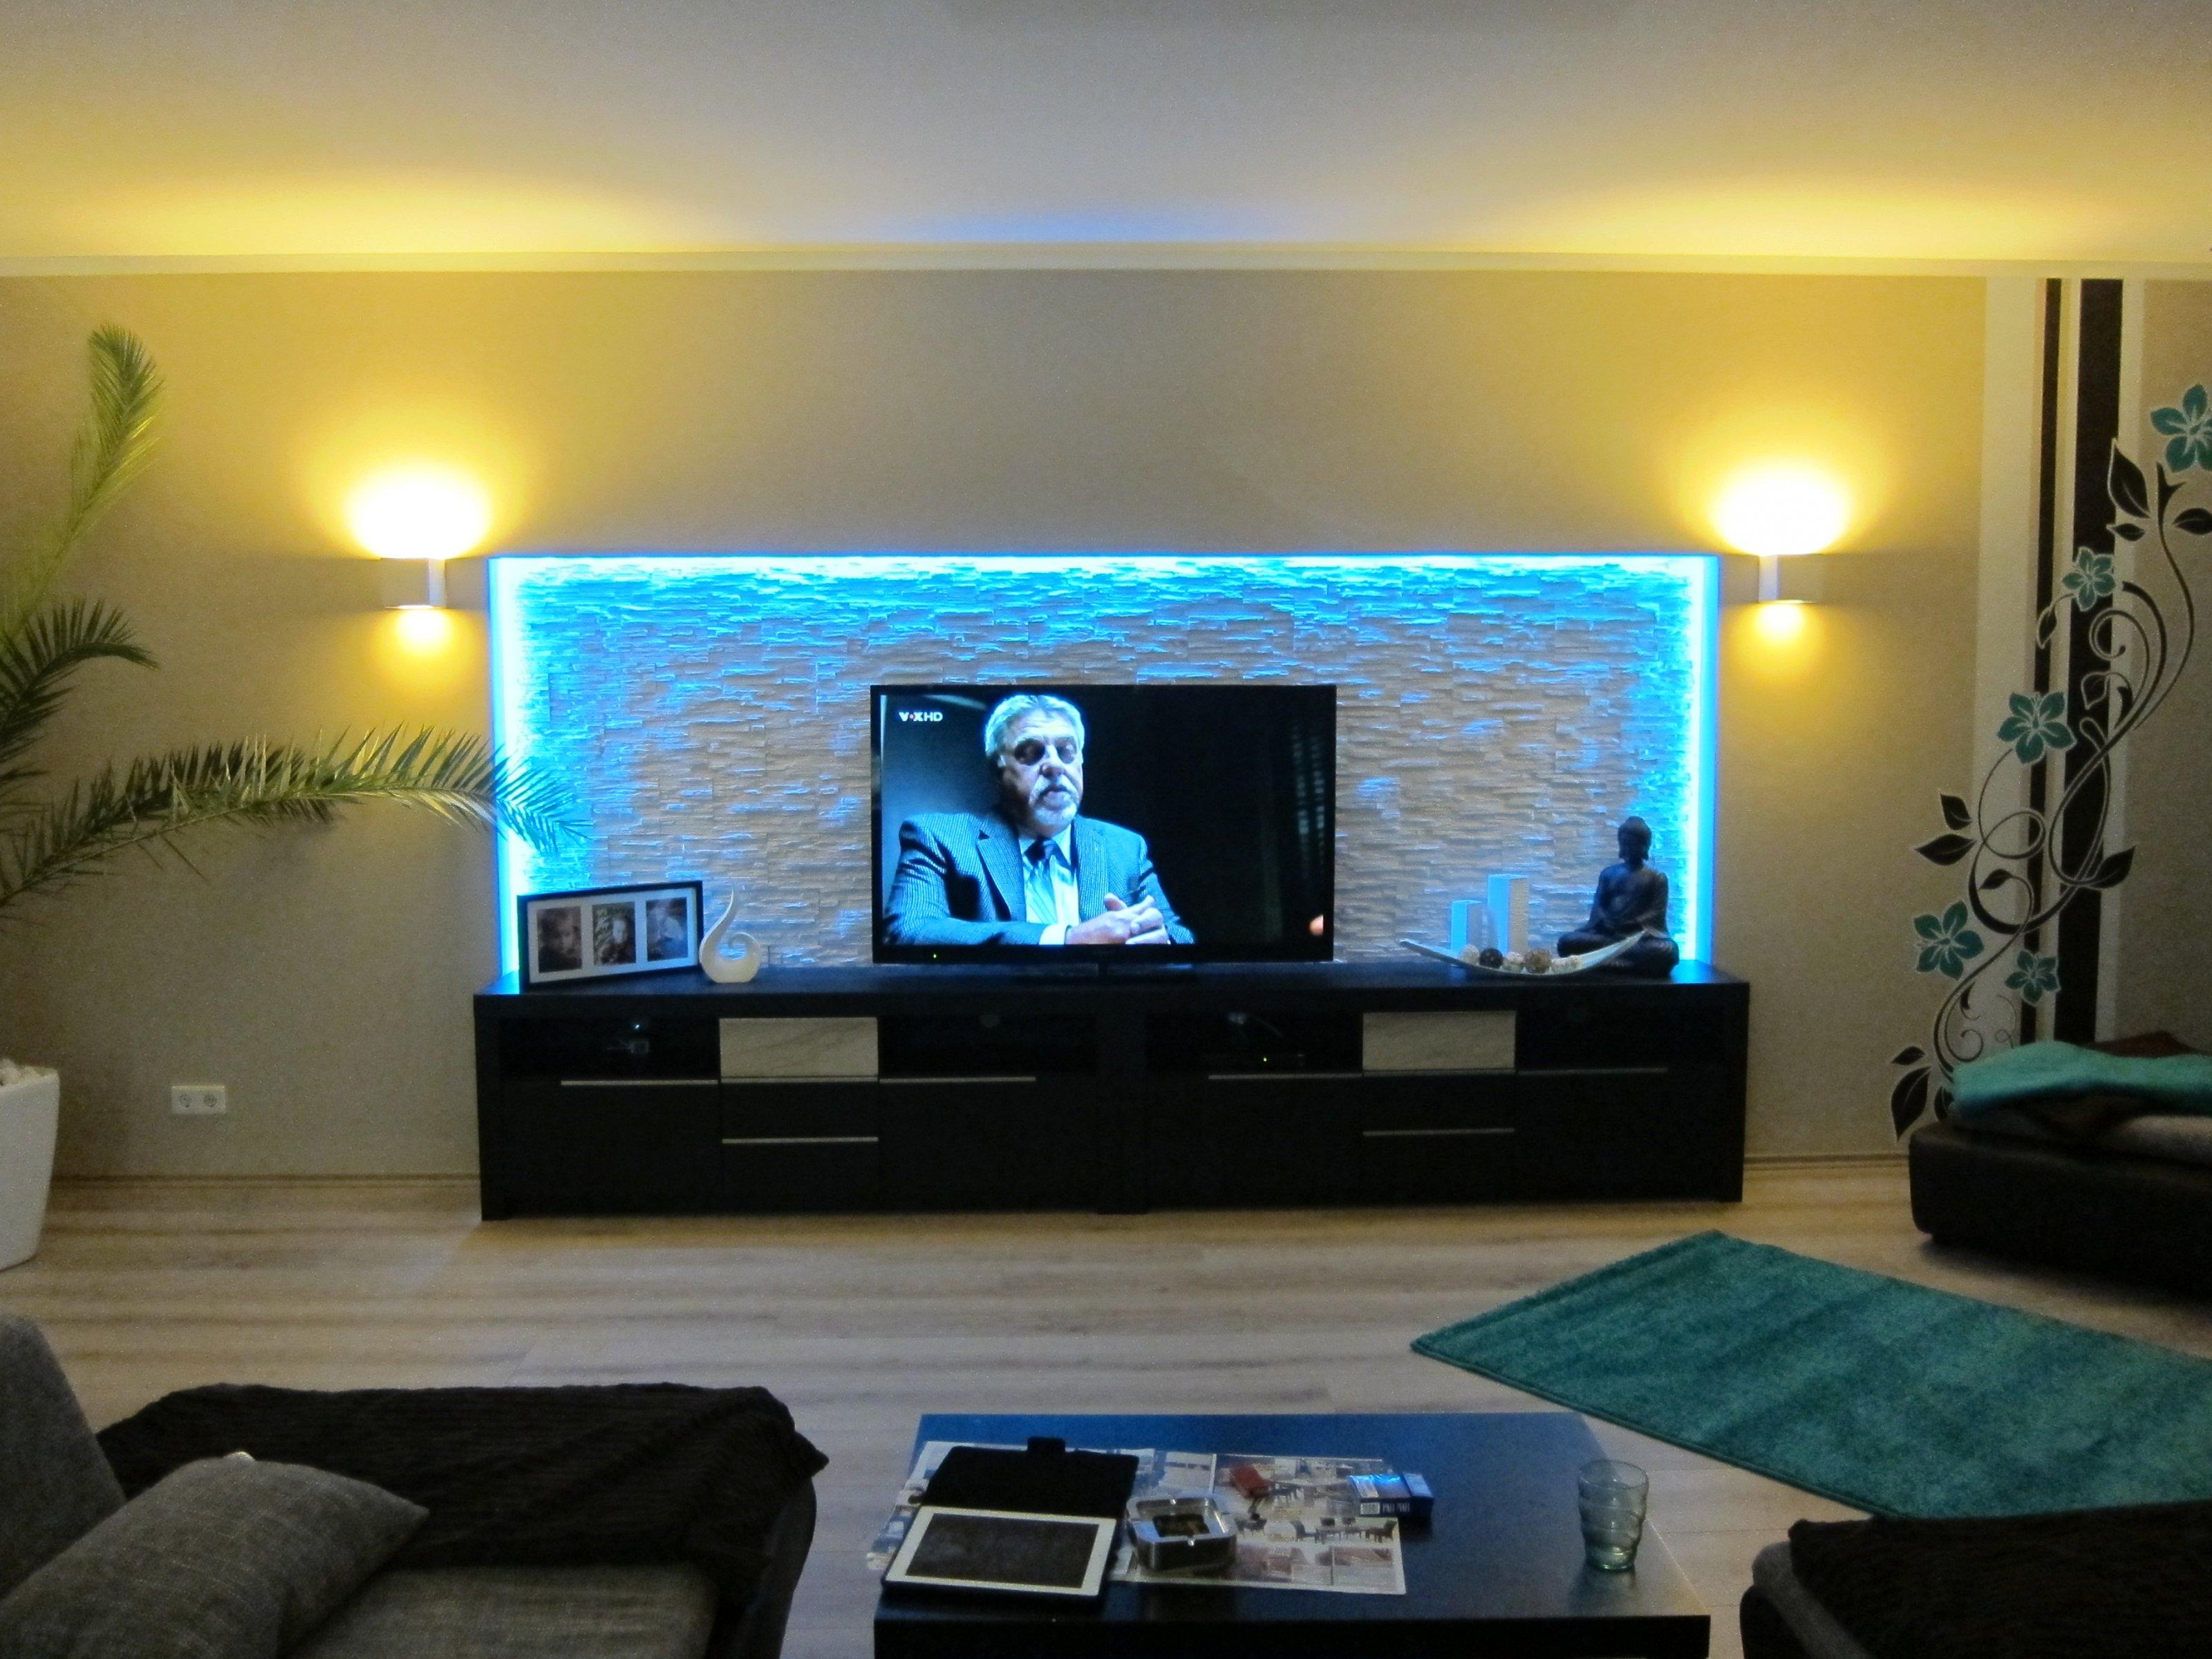 Welche farbe passt kissen passt zu graue sofa for Wohnzimmer quadratmeter